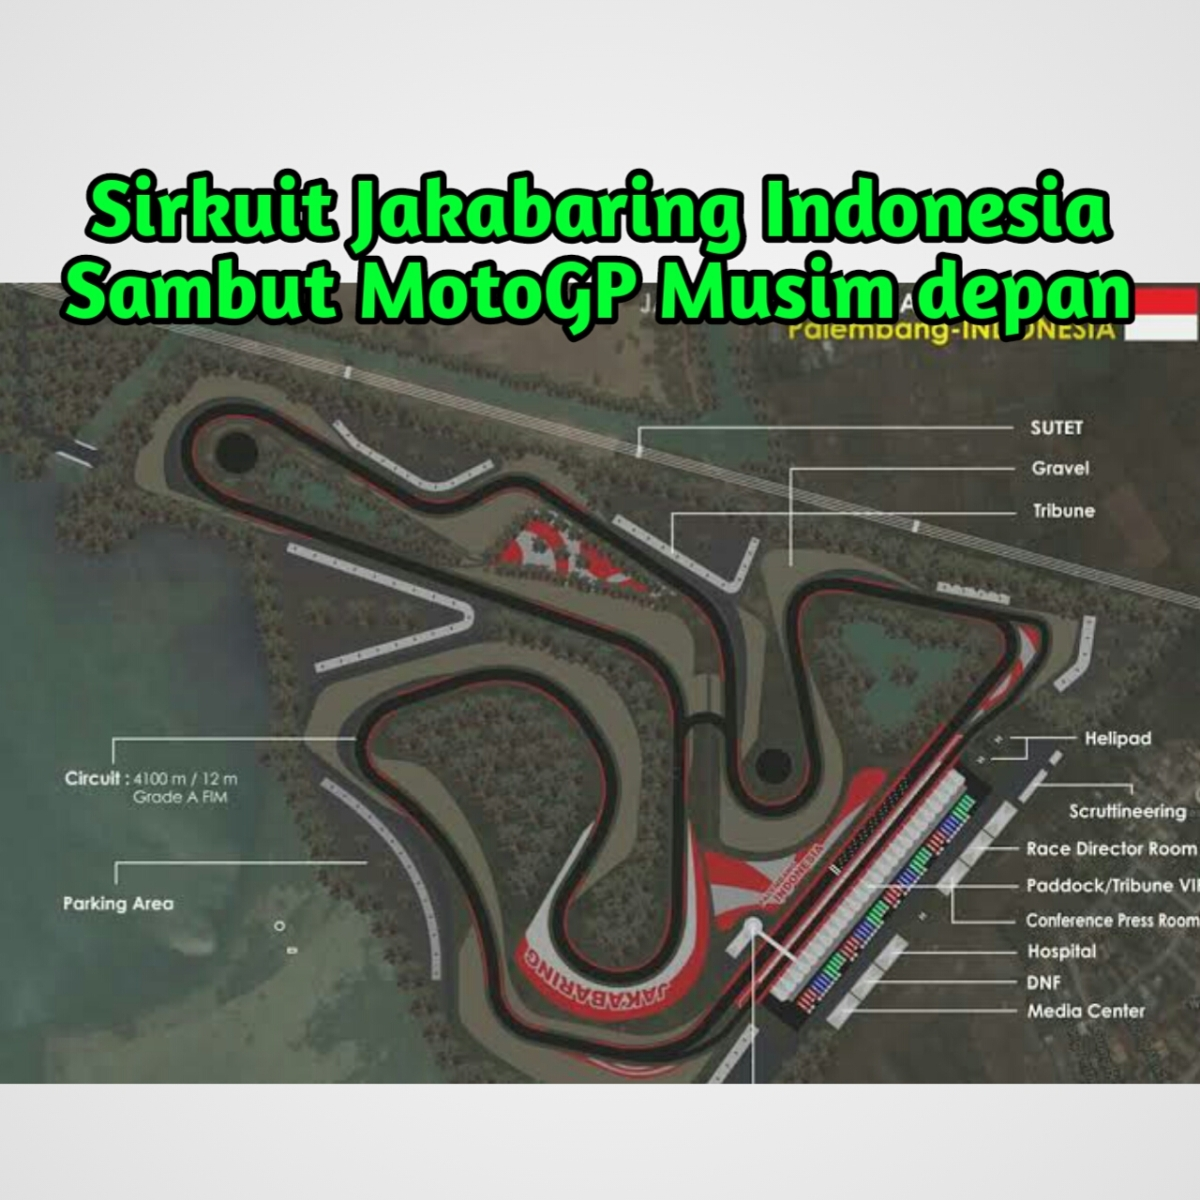 Sirkuit Jakabaring-Palembang-Indonesia Siap Sambut MotoGP Tahun ini